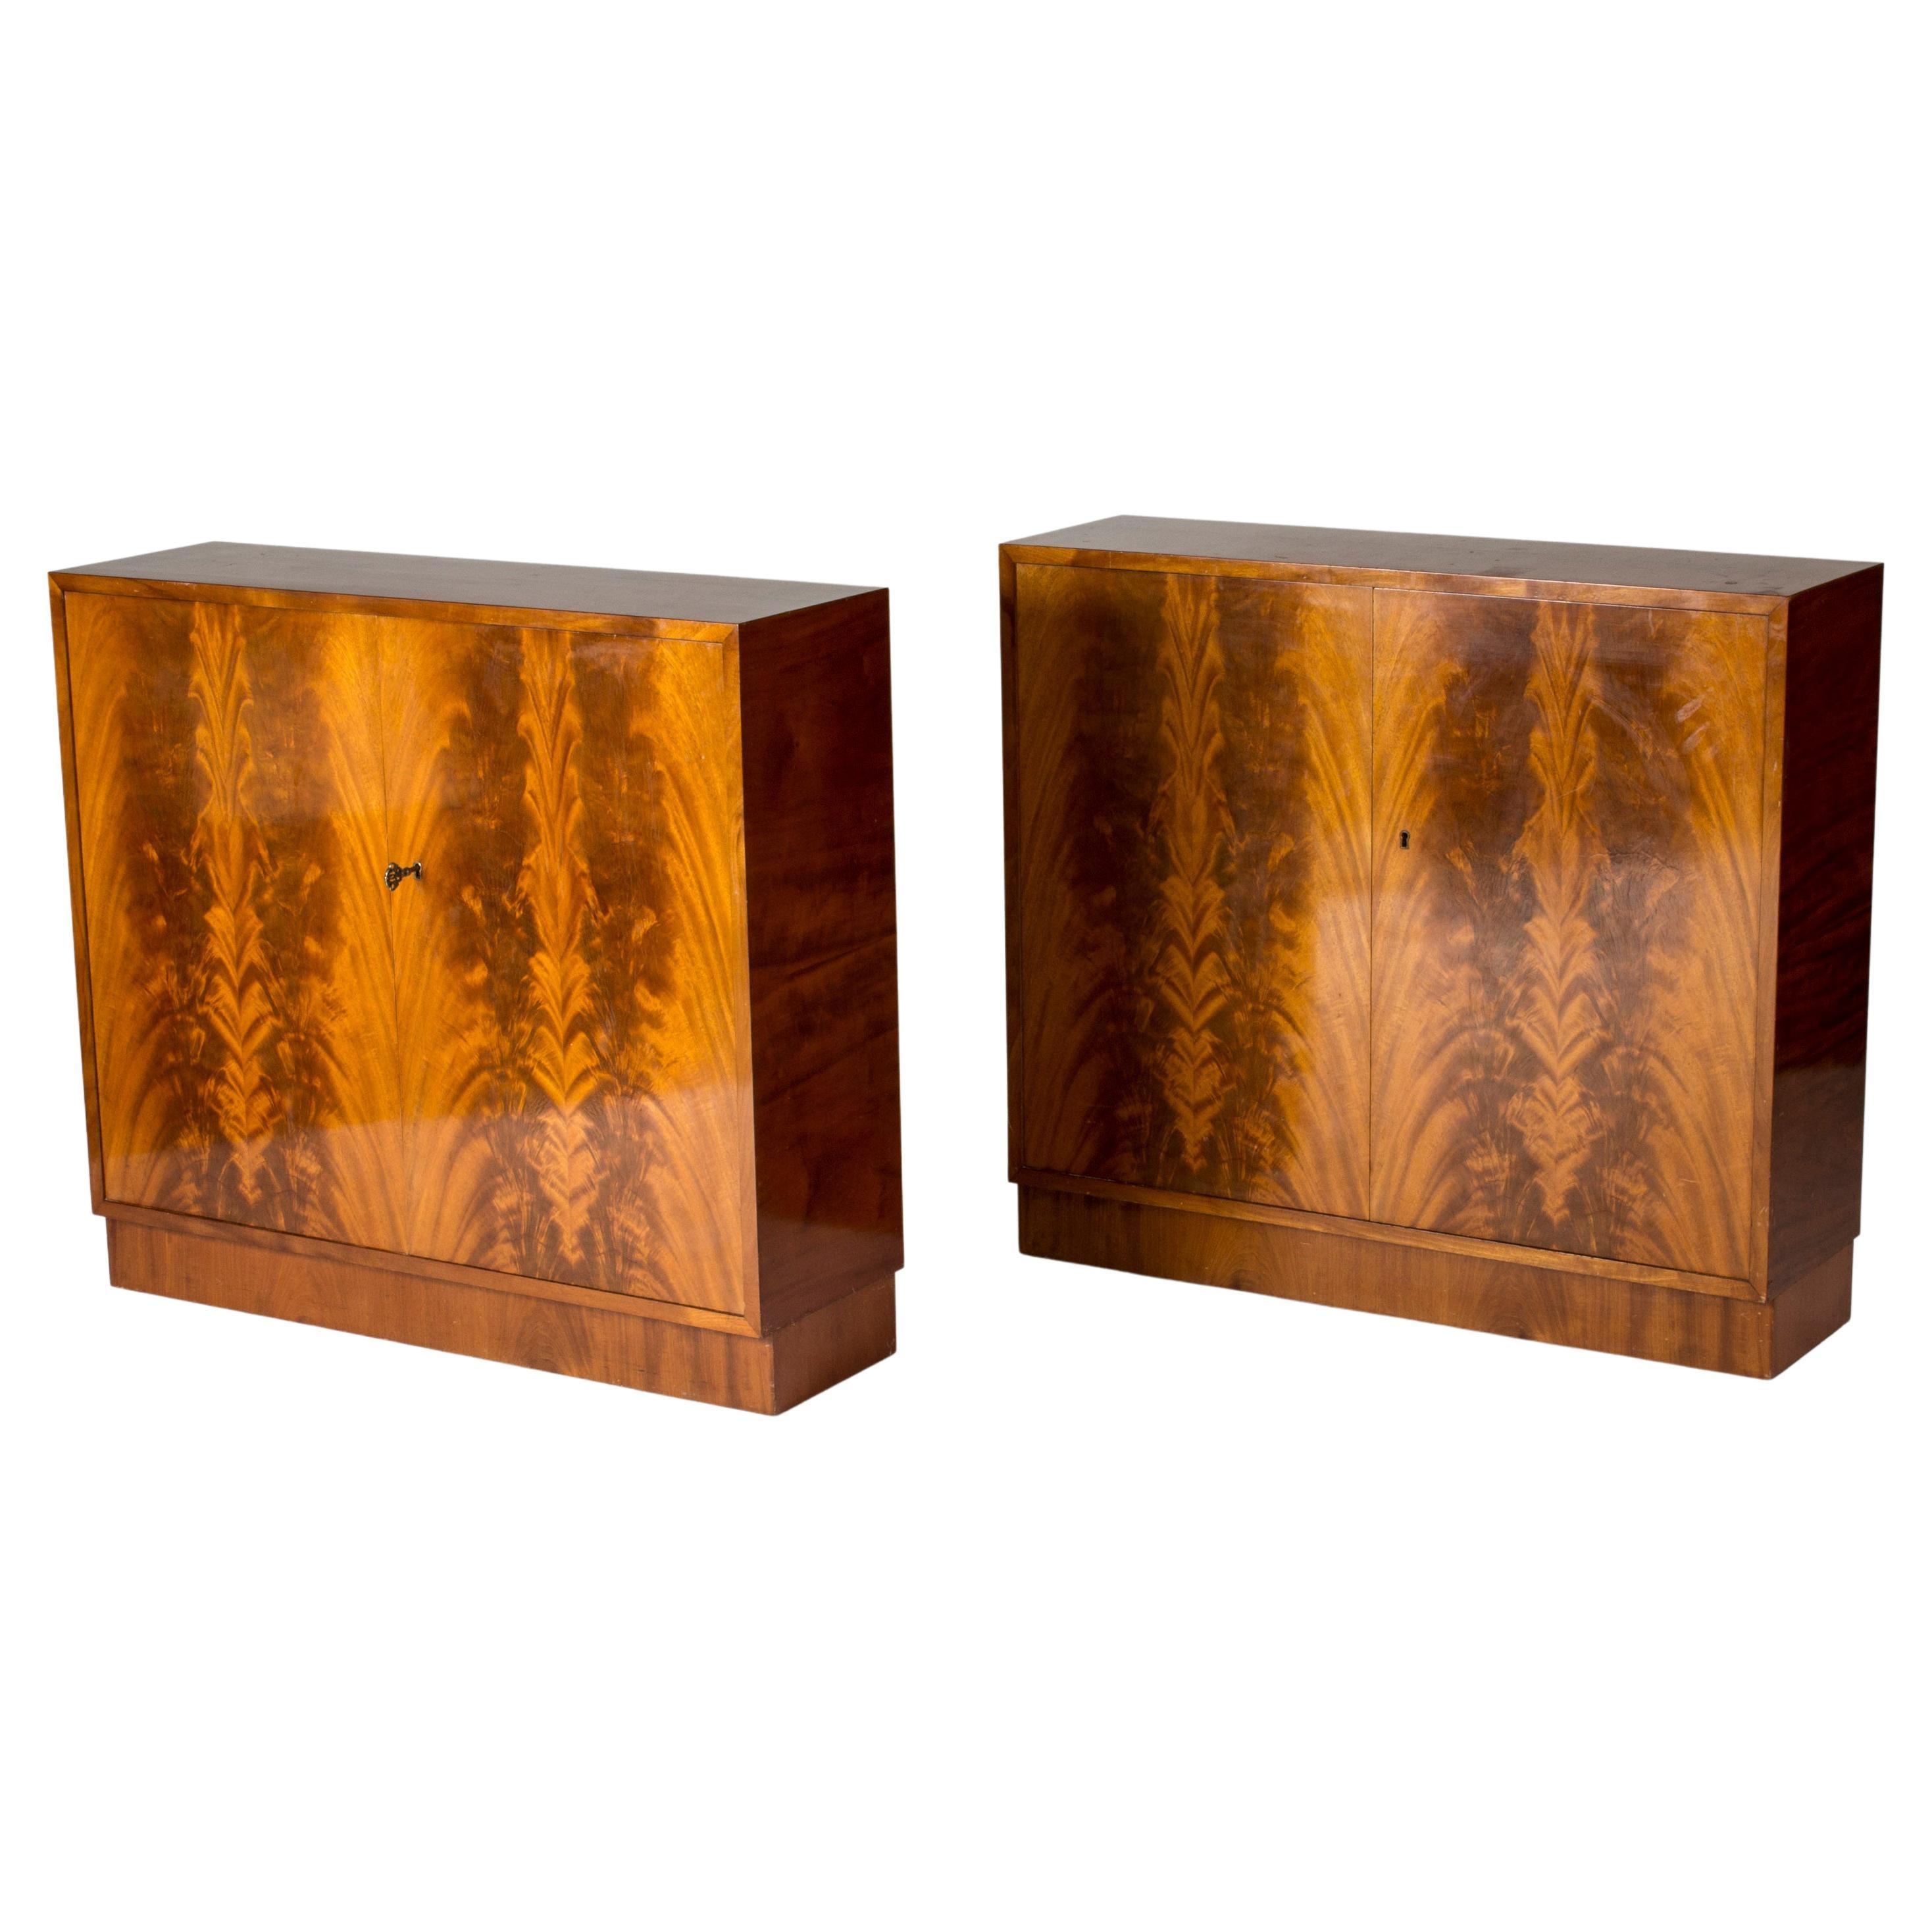 Pair of Swedish Midcentury Mahogany Cabinets, 1950s